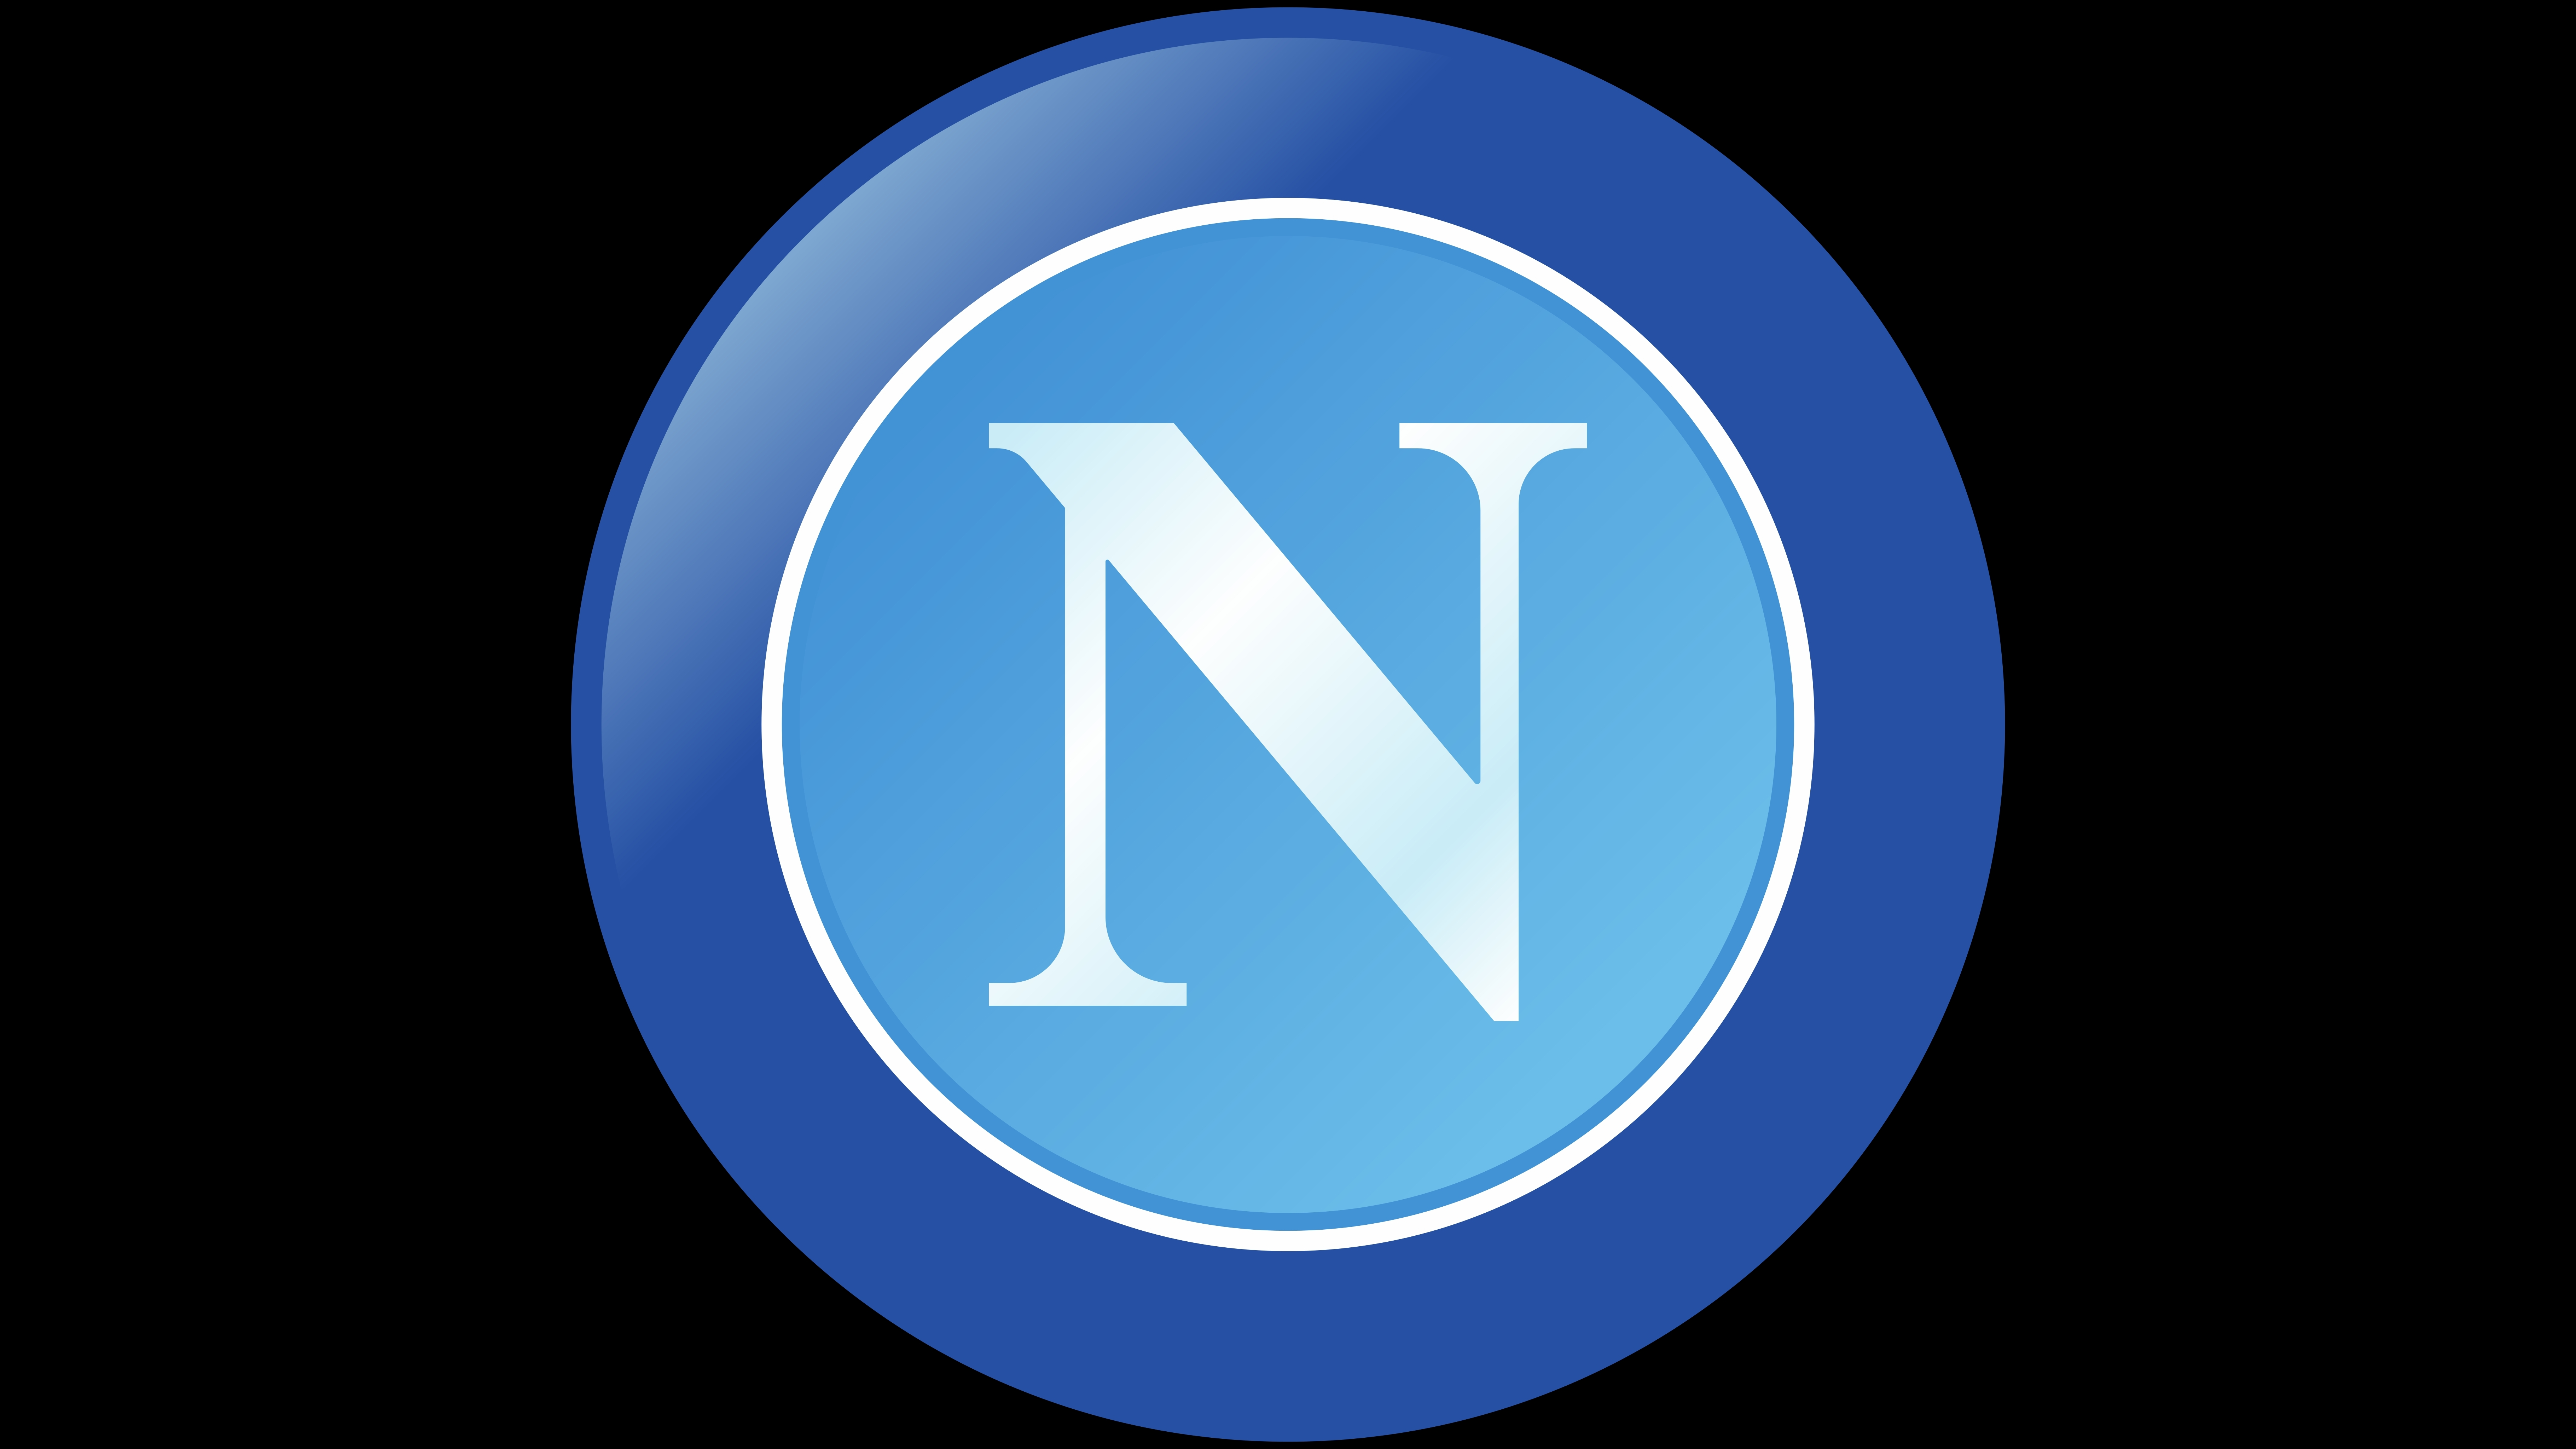 S S C Napoli: S.S.C. Napoli 5k Retina Ultra HD Wallpaper